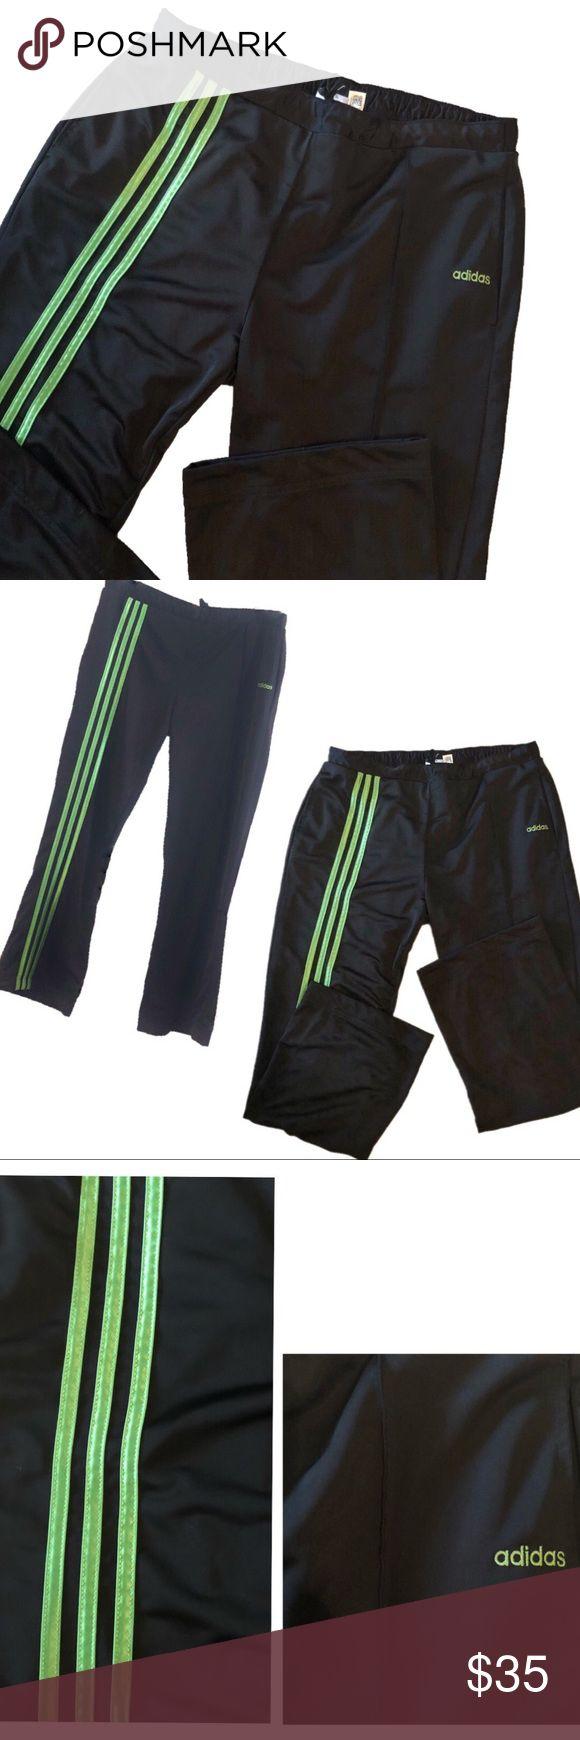 Adidas Black \u0026 Neon Green Stripe Track